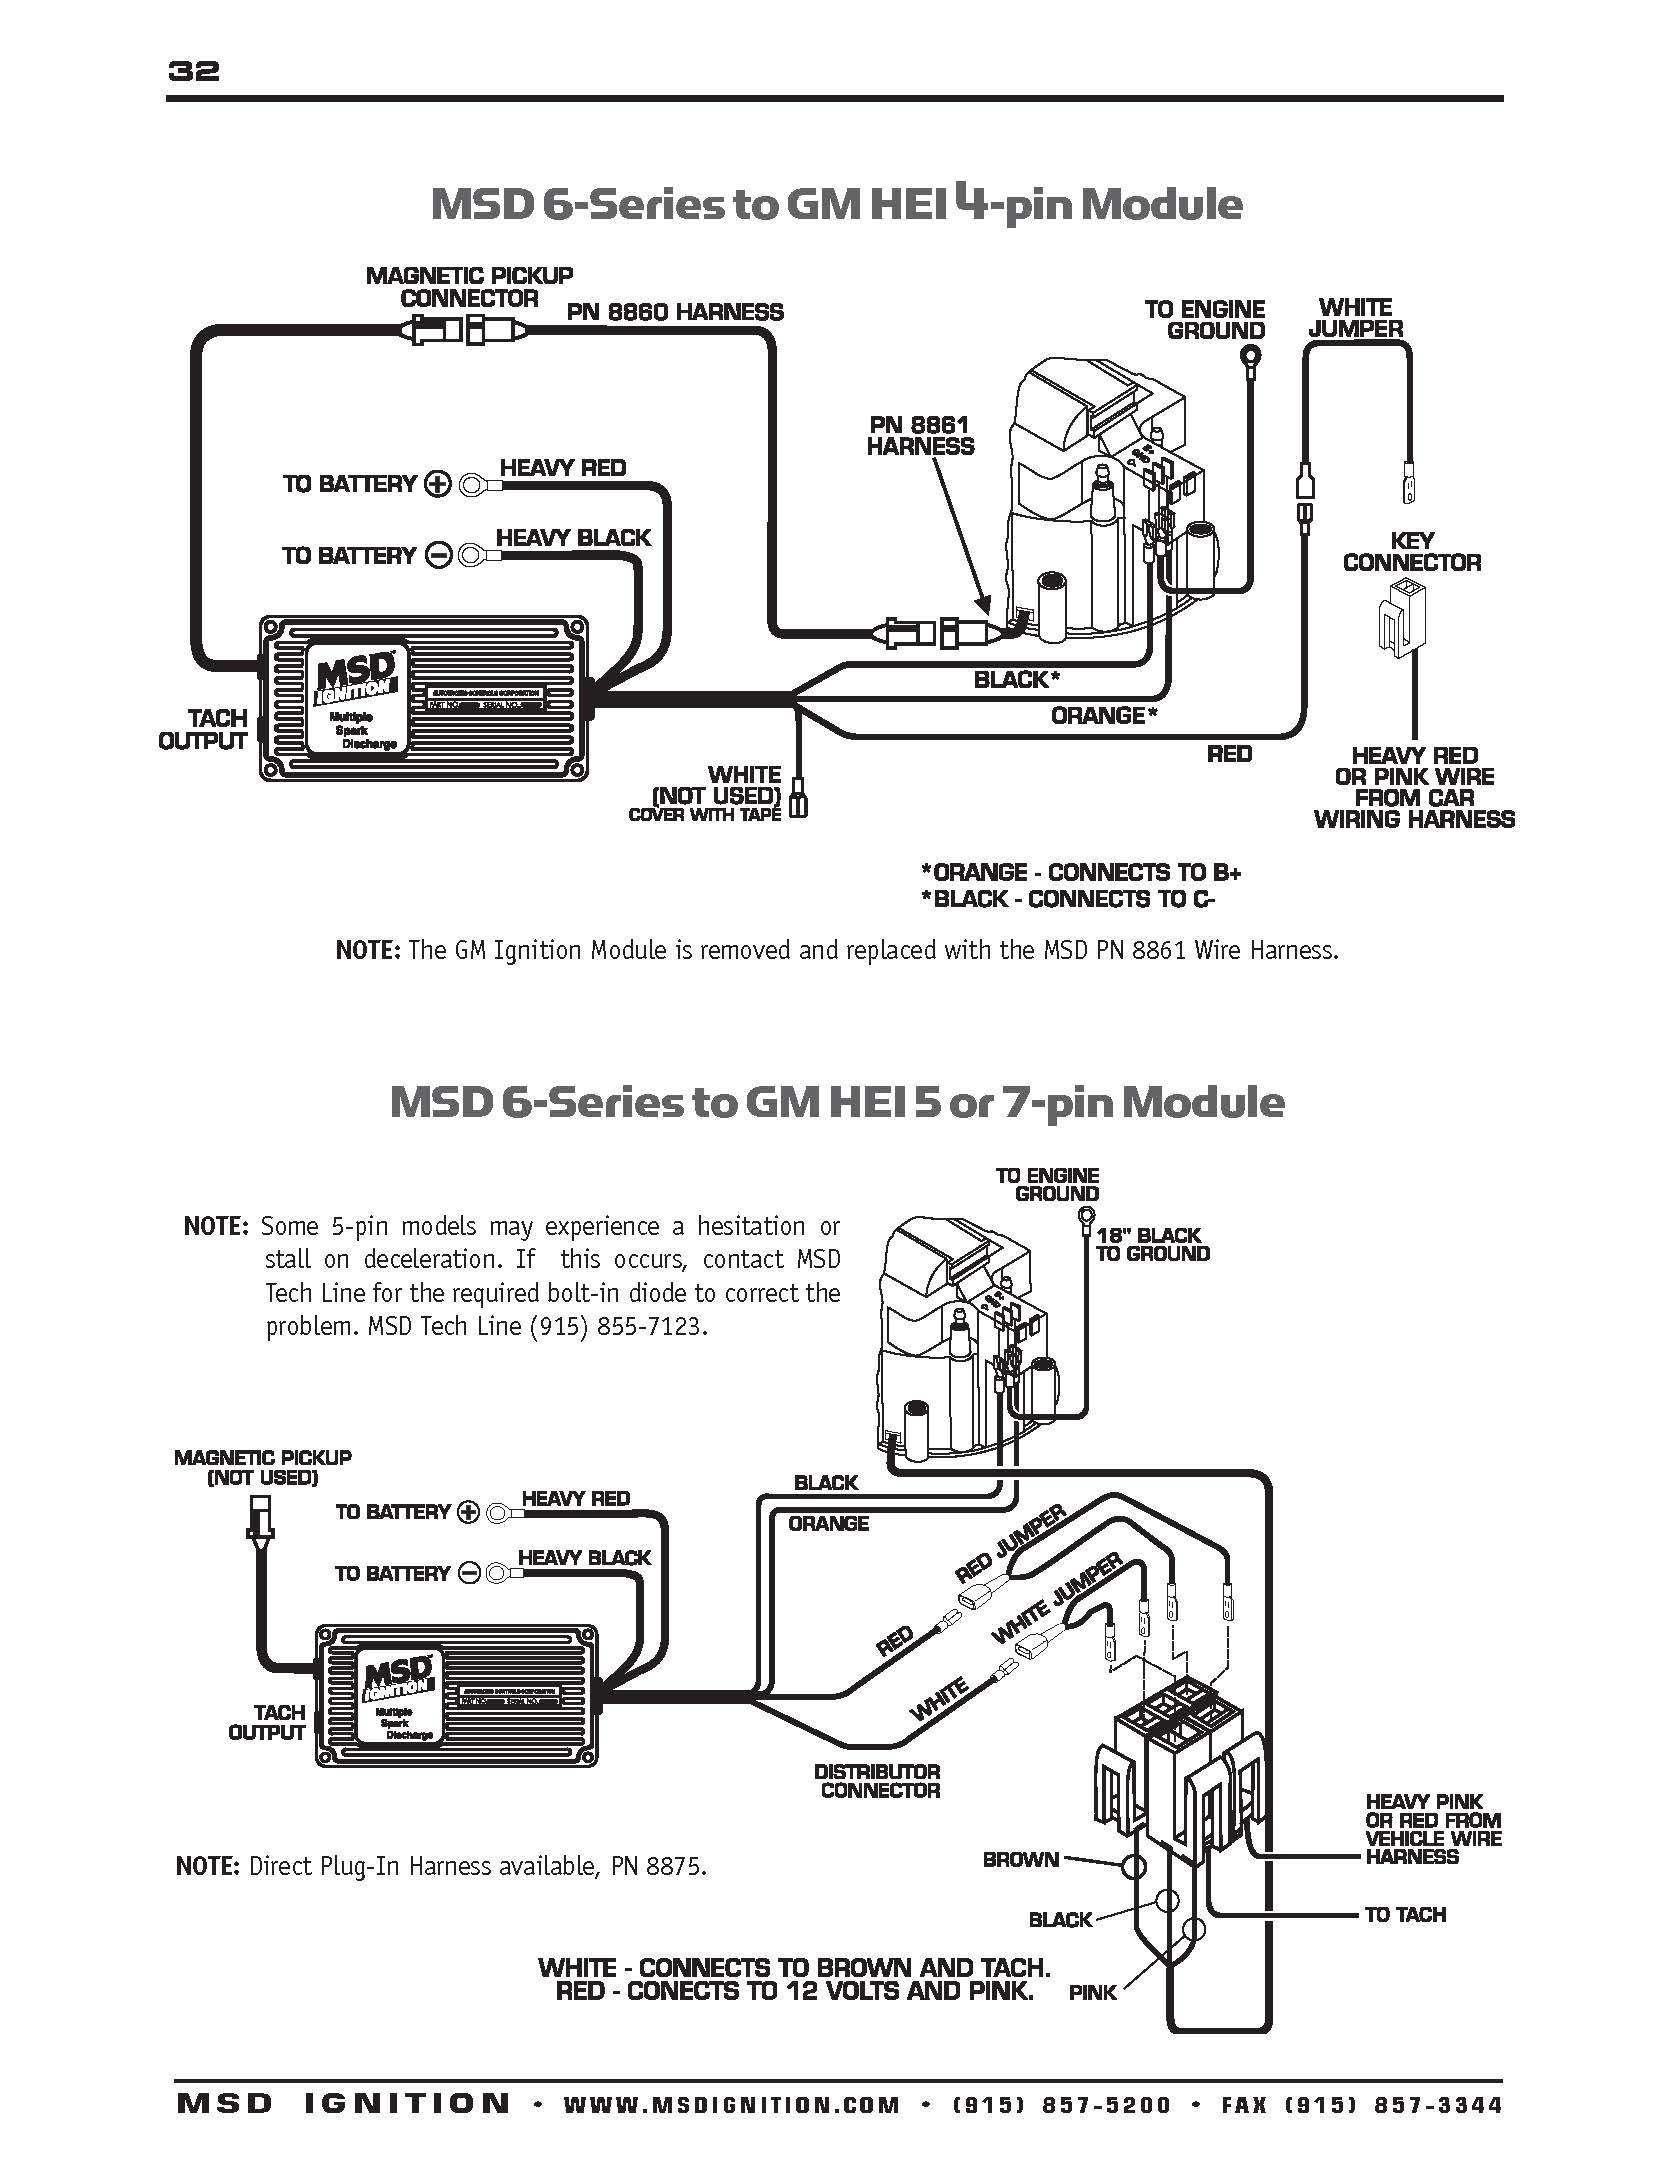 User Manual Msd 6al Wiring Diagram Chevy Hei Within Msd 6Al Wiring Diagram